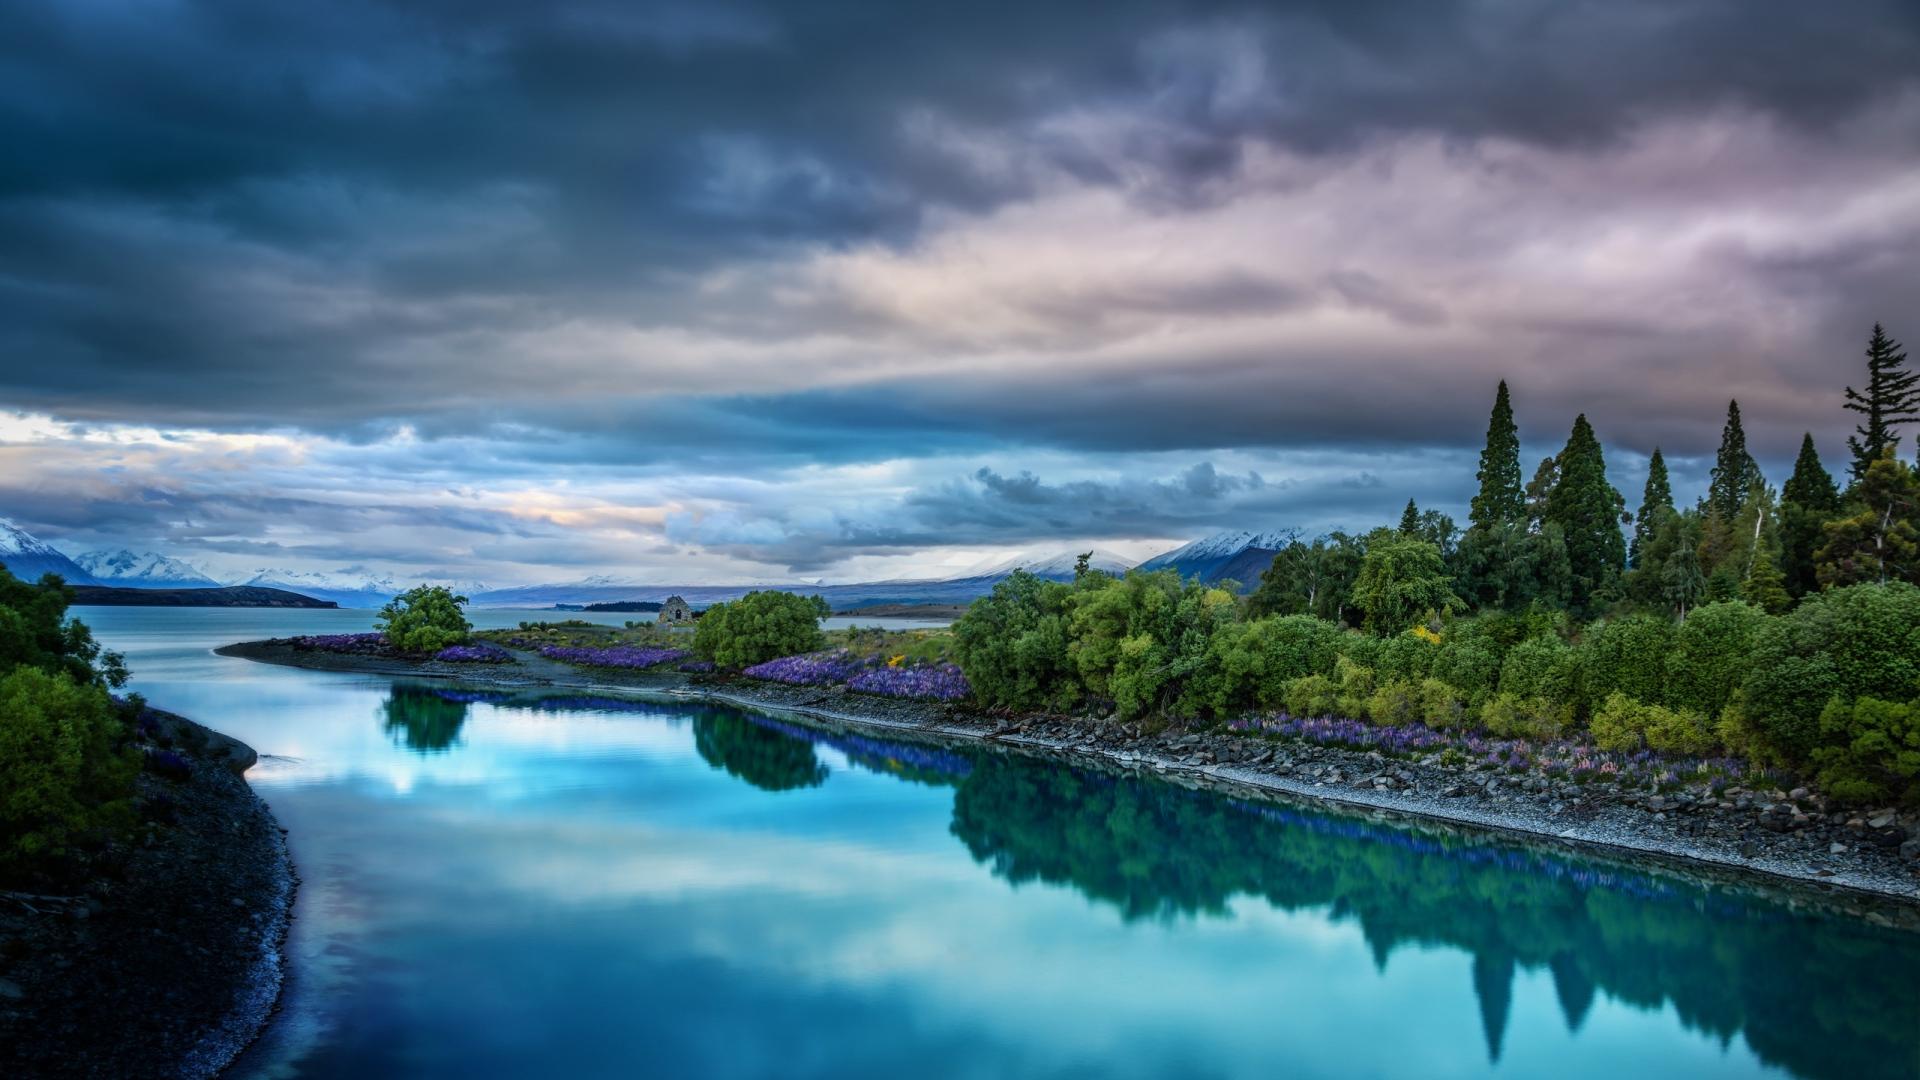 Download Wallpaper 1920x1080 sky, nature, river, landscape Full HD 1080p HD Background